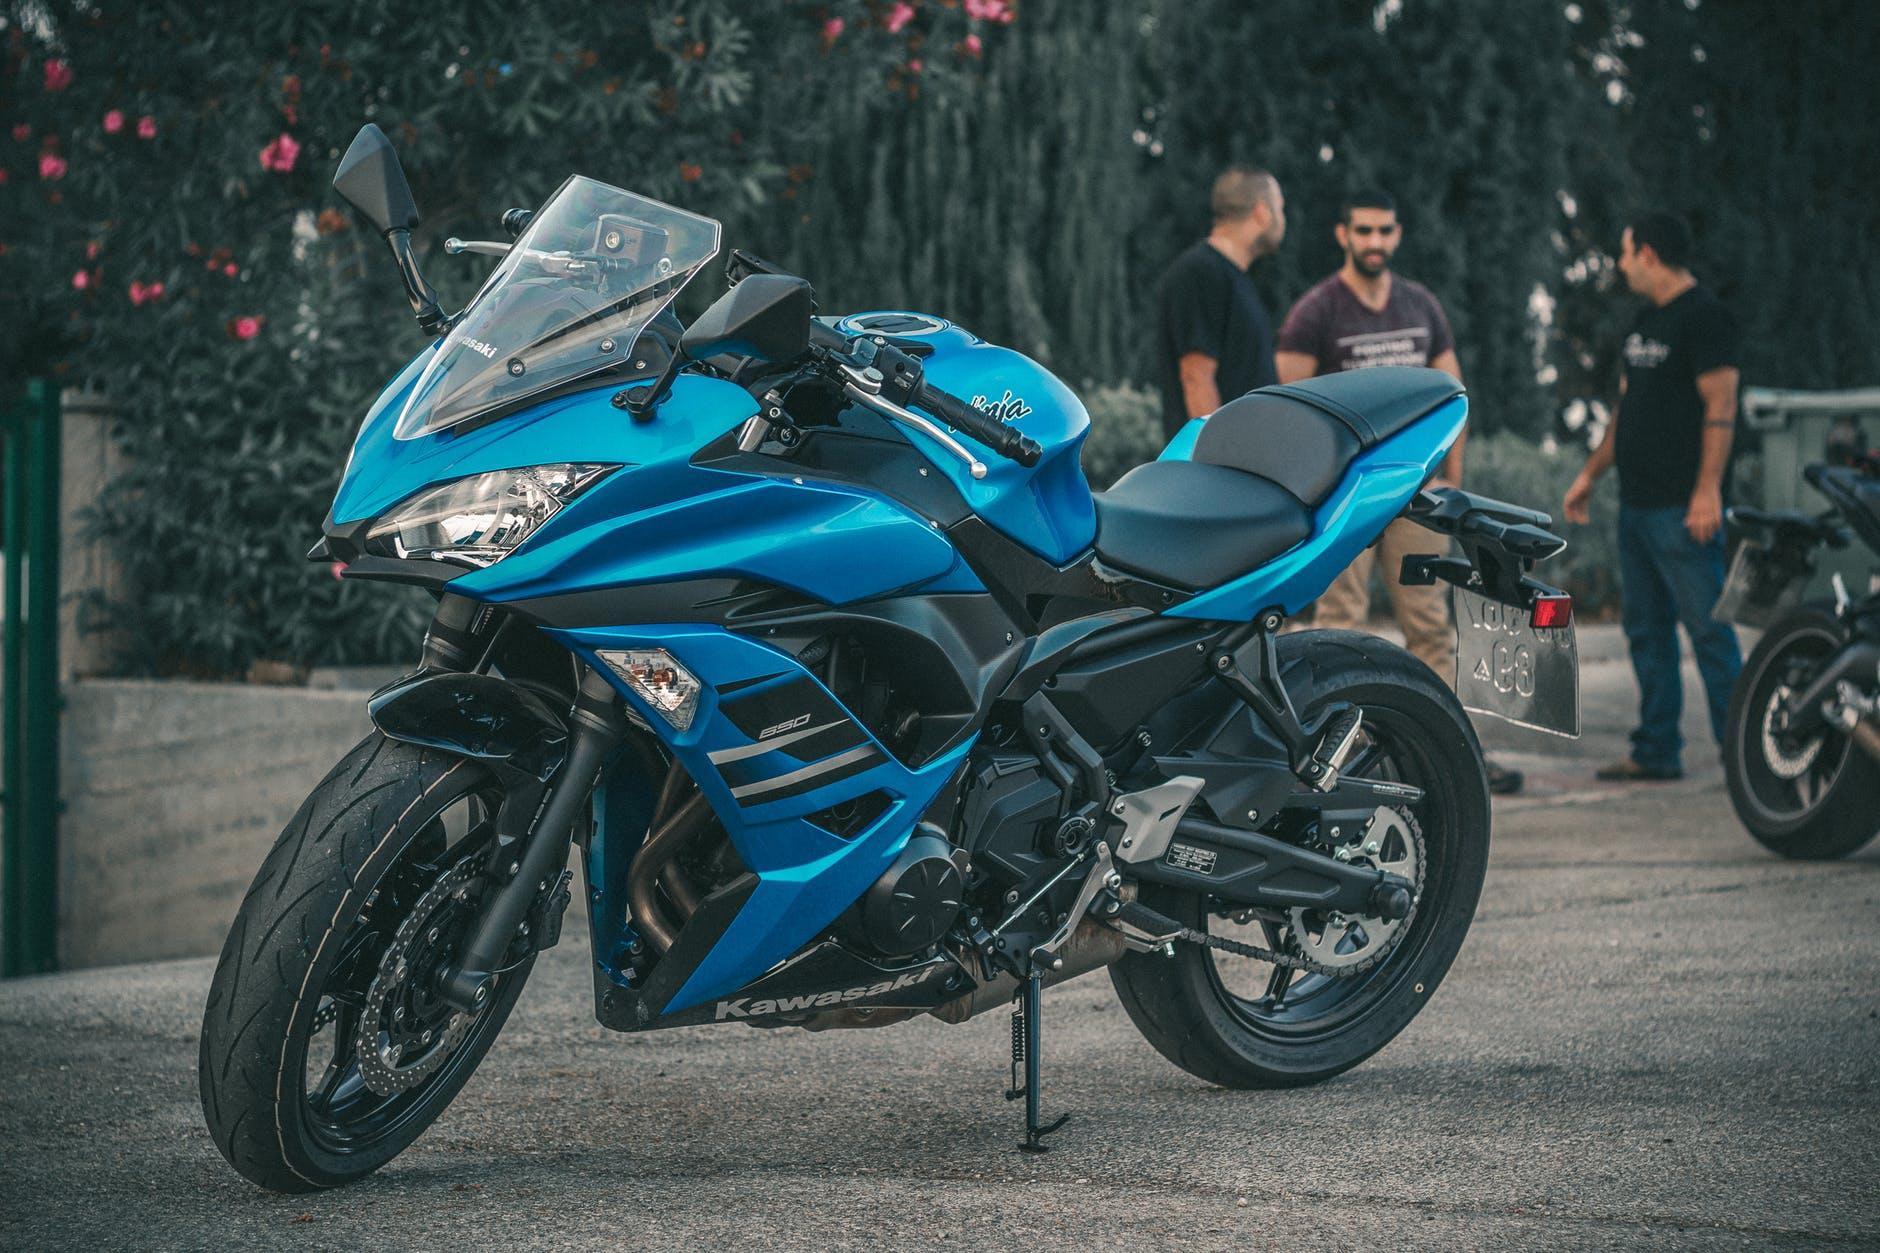 motorkleding in de zomer